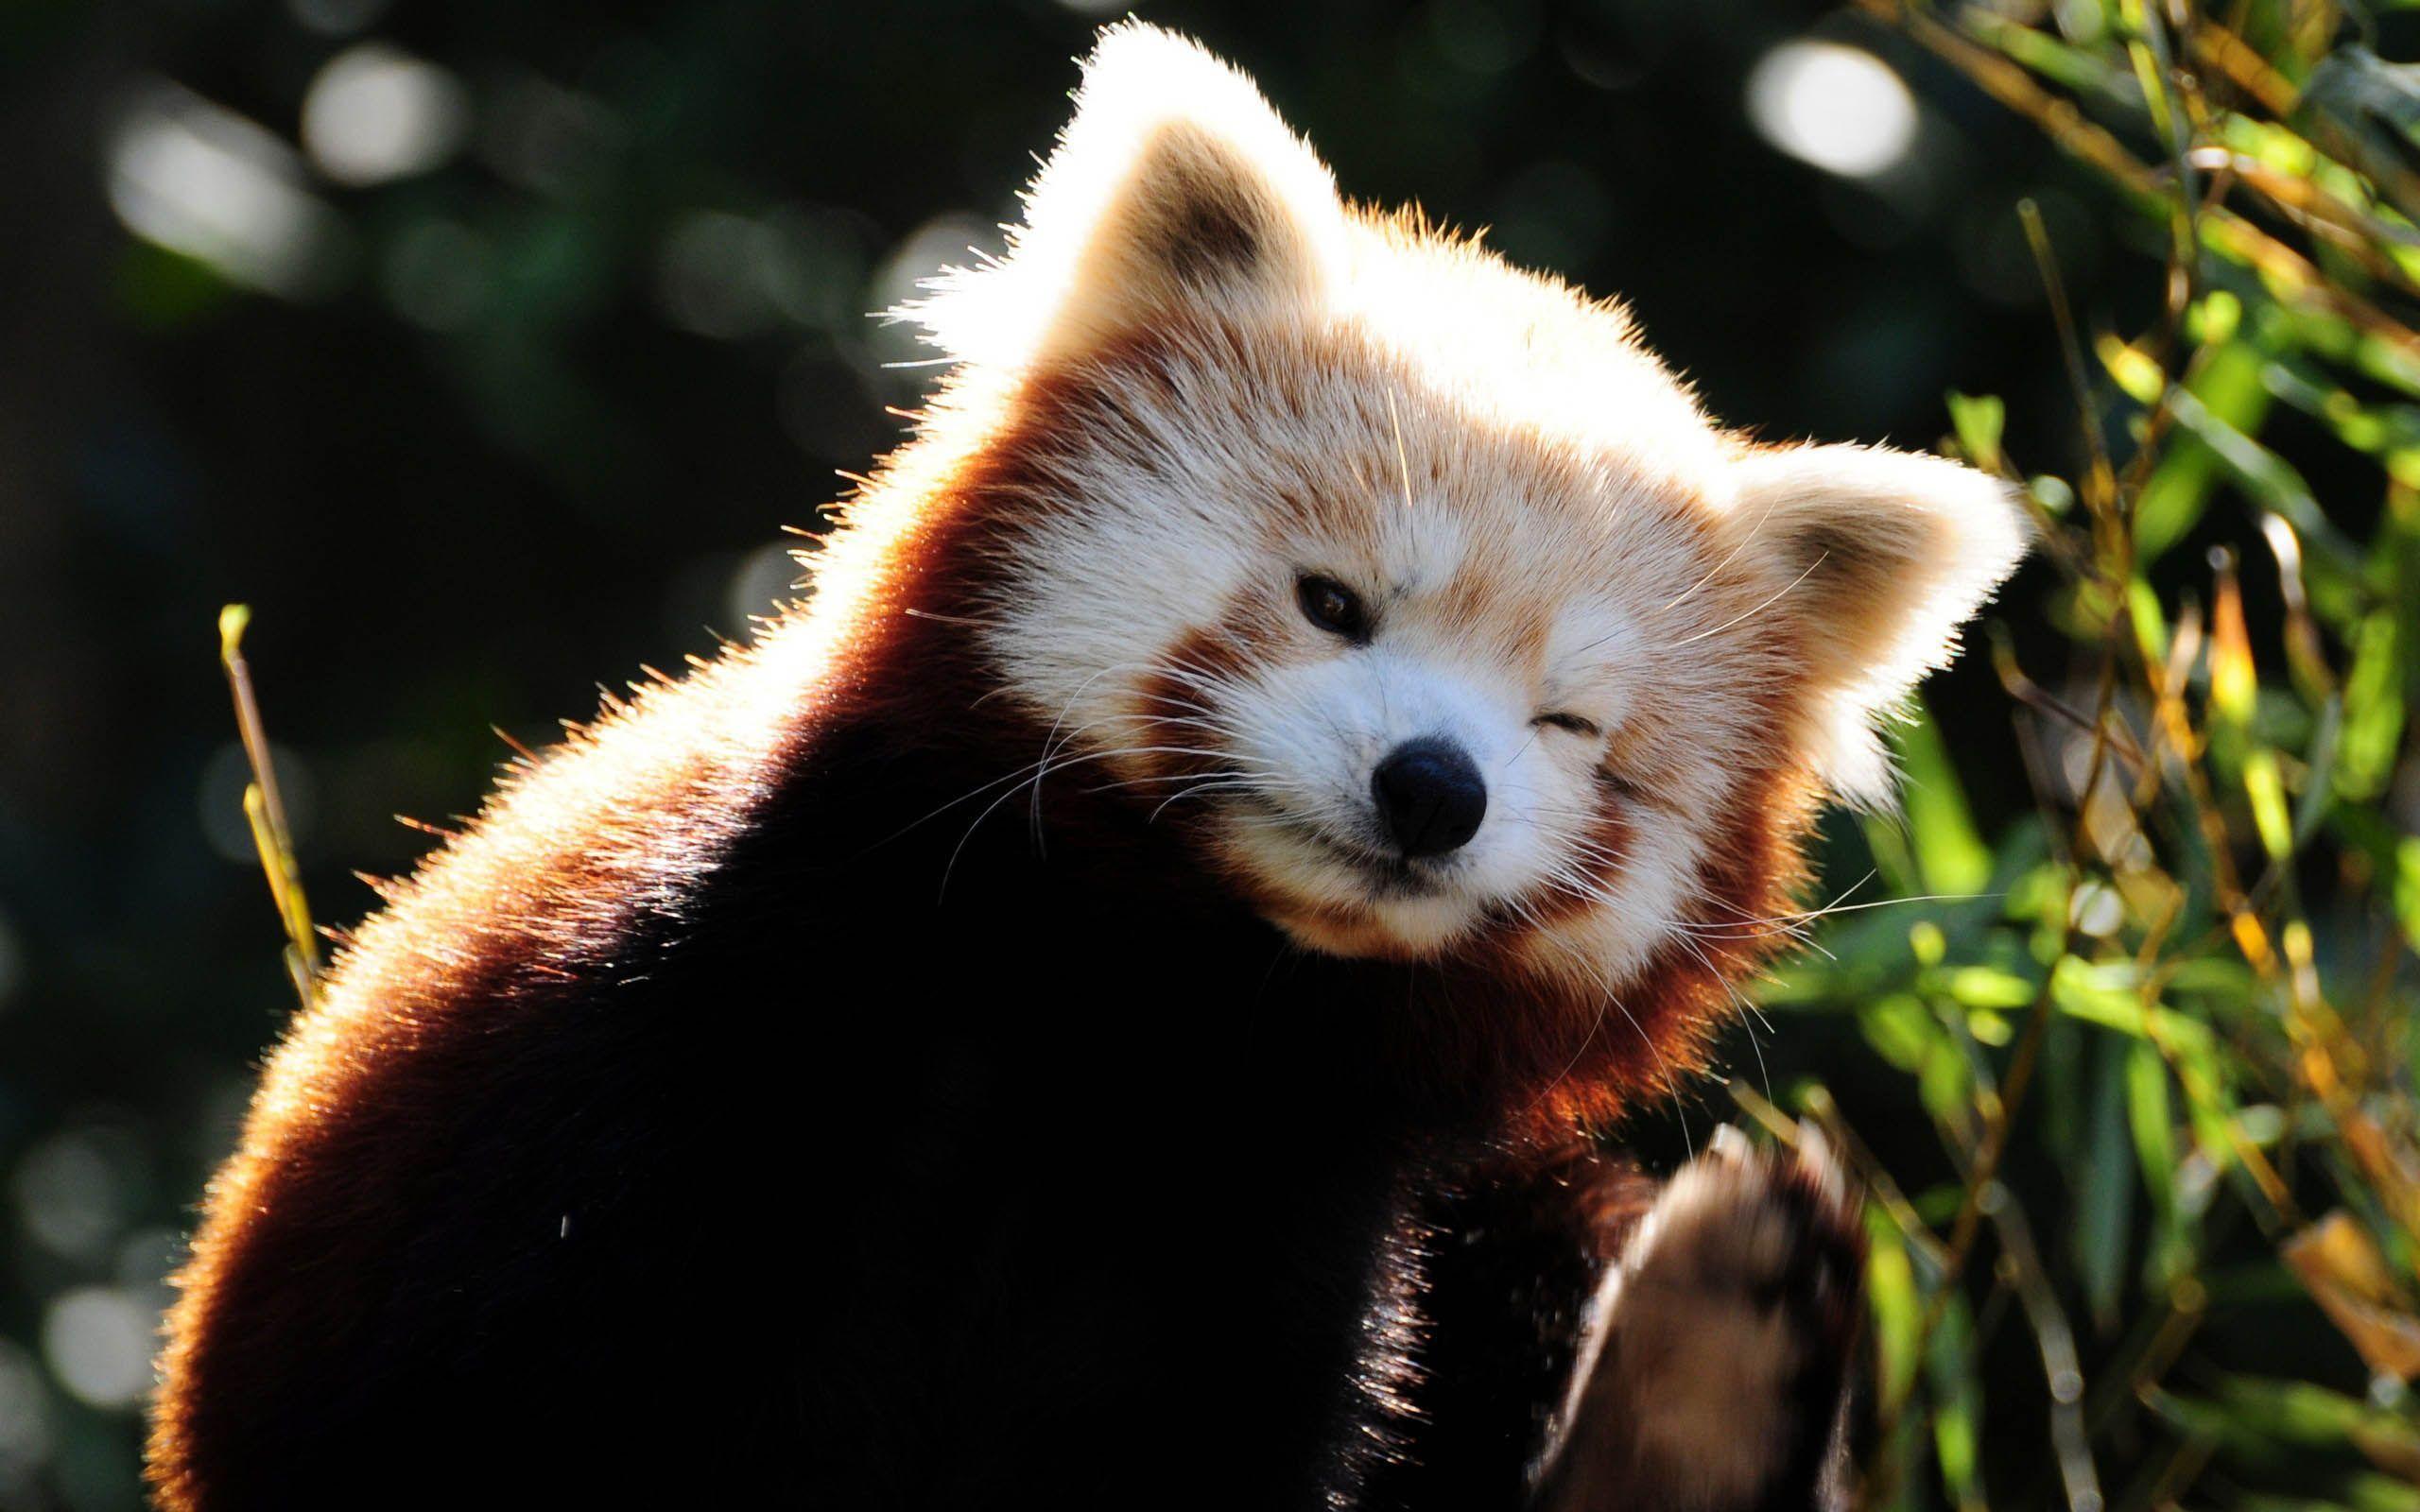 cute red panda Google Search Dignity Pinterest